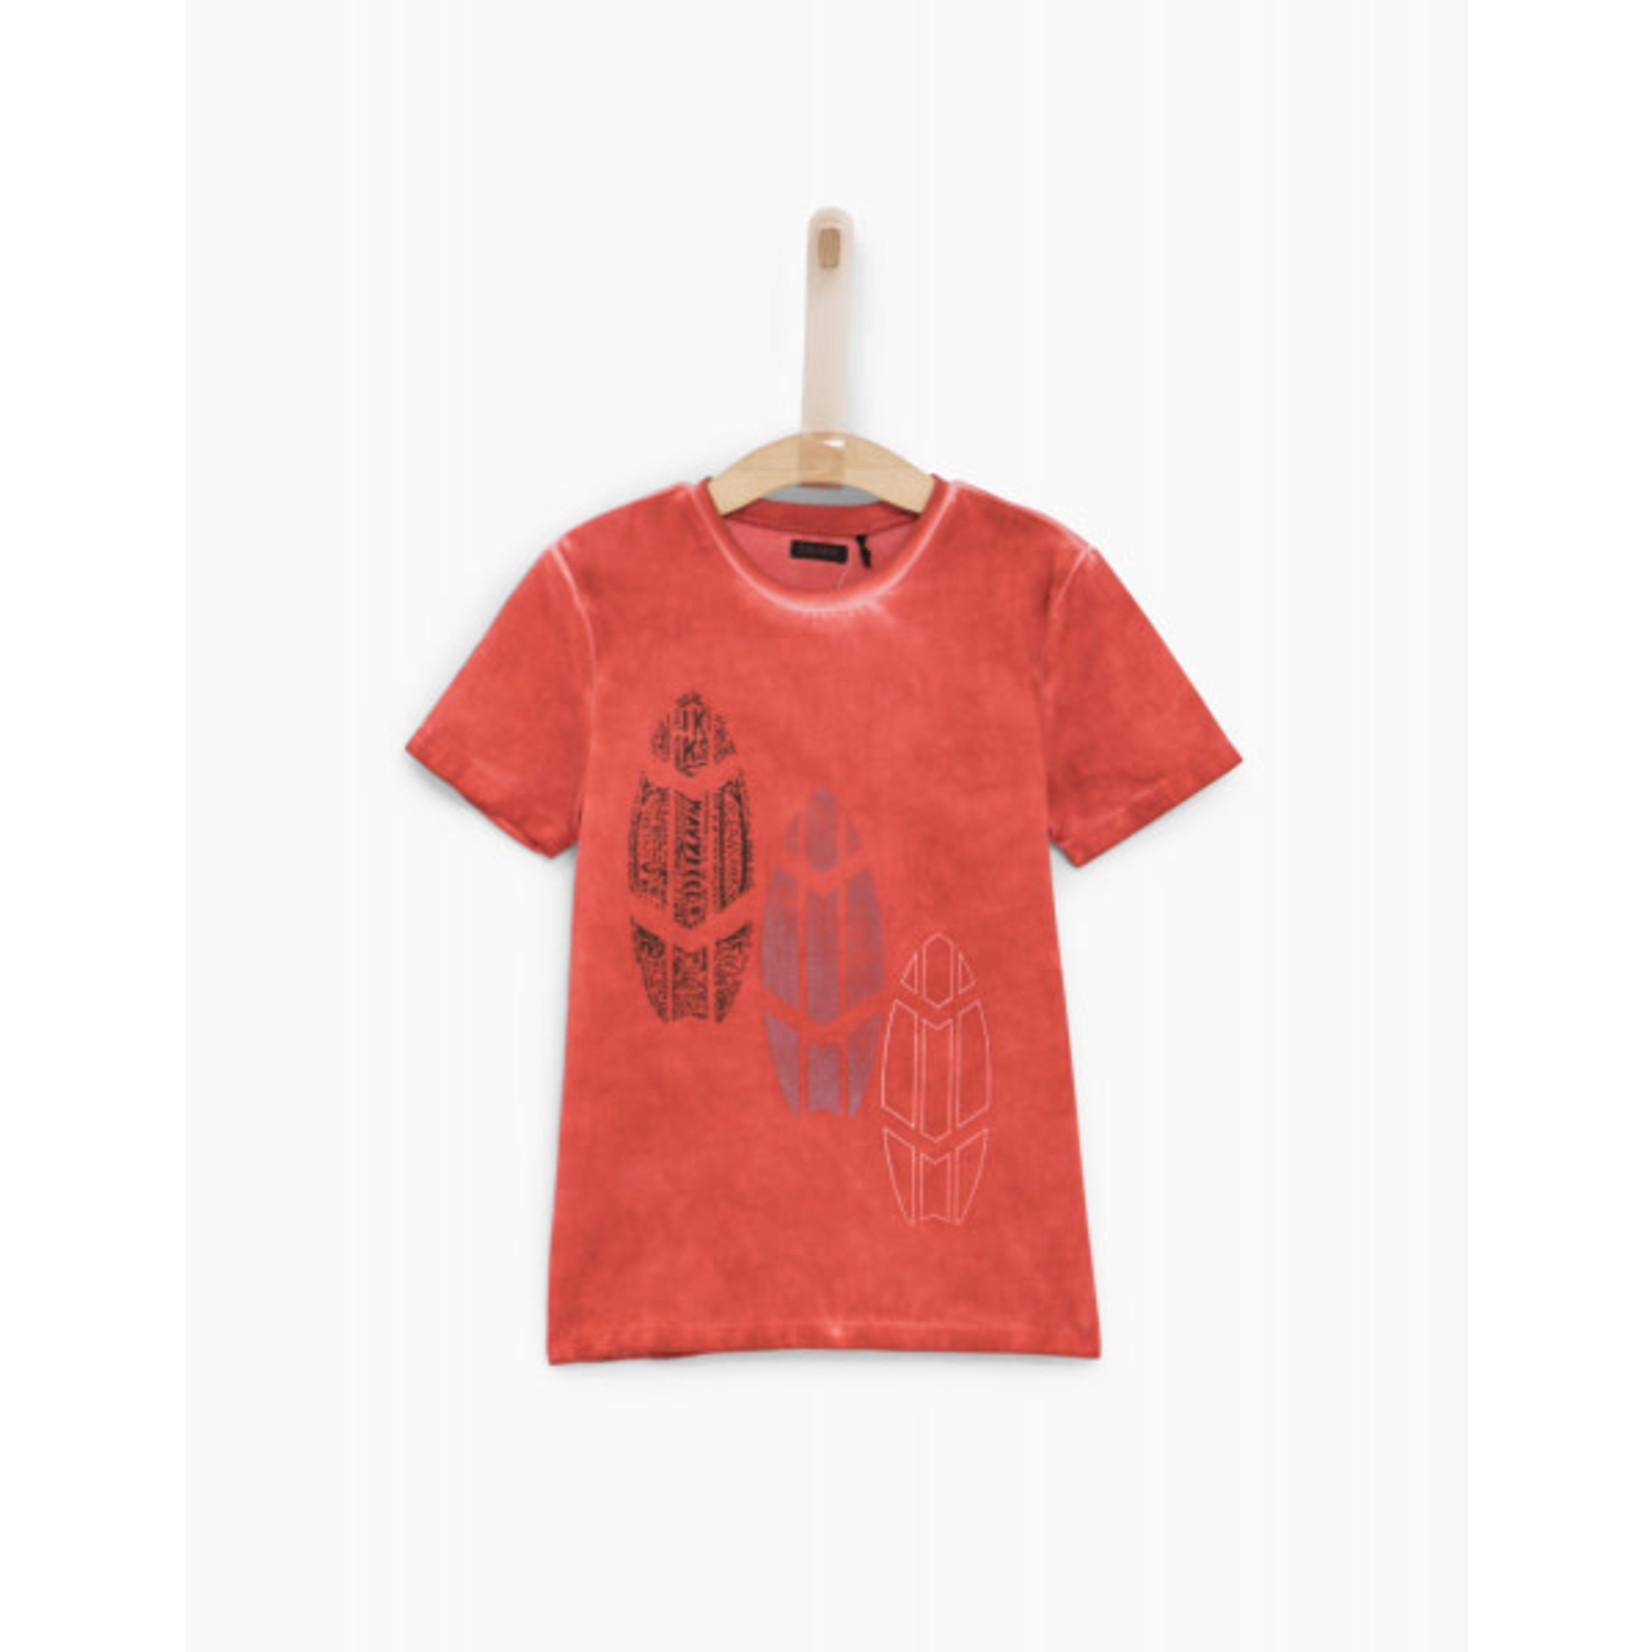 IKKS T-shirt Love of the ocean XS10043